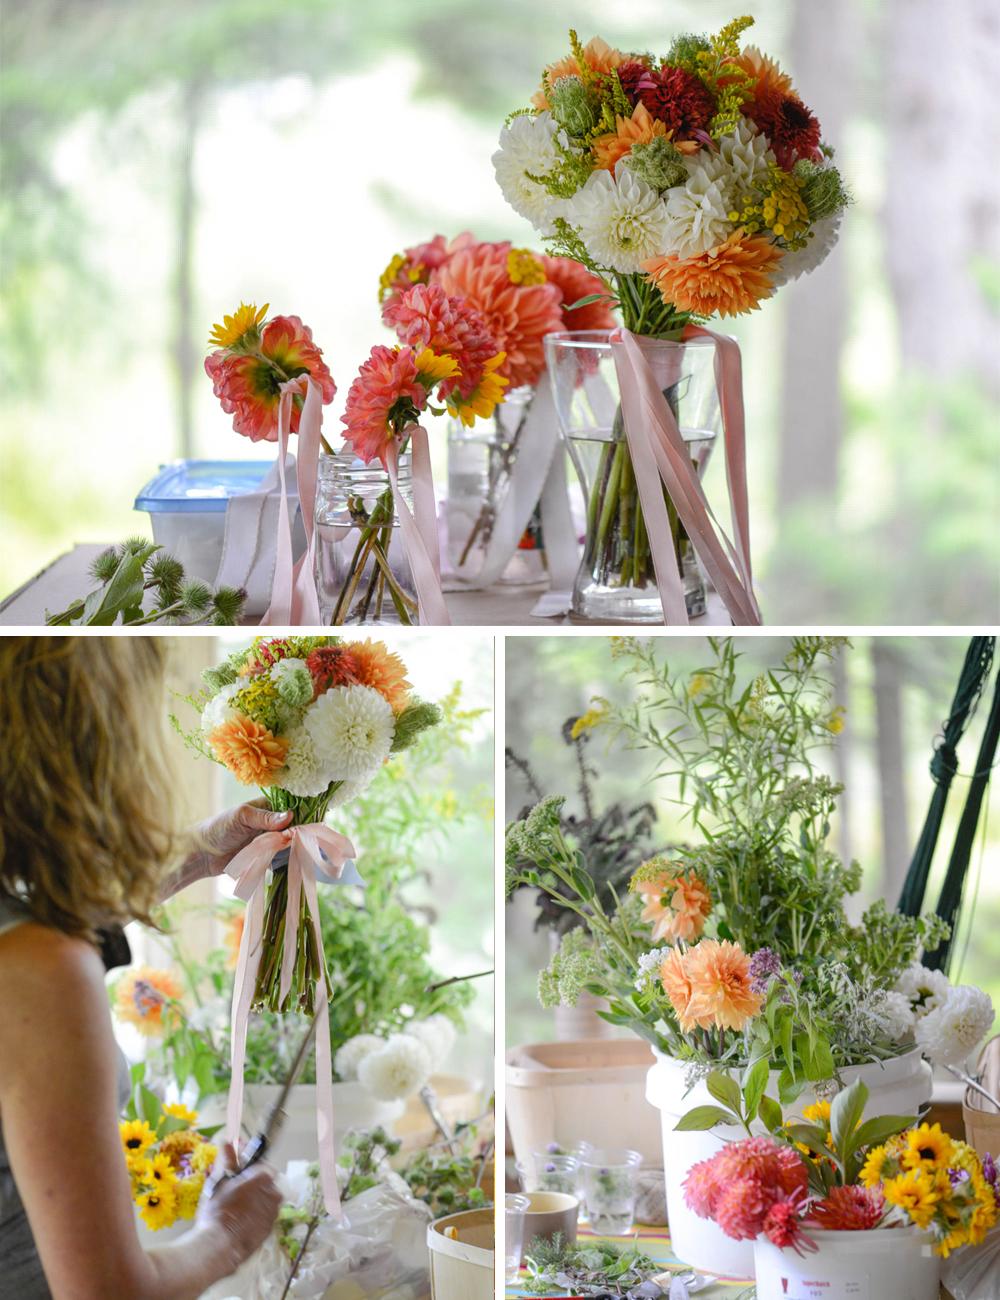 Handmade DIY wedding flowers 2